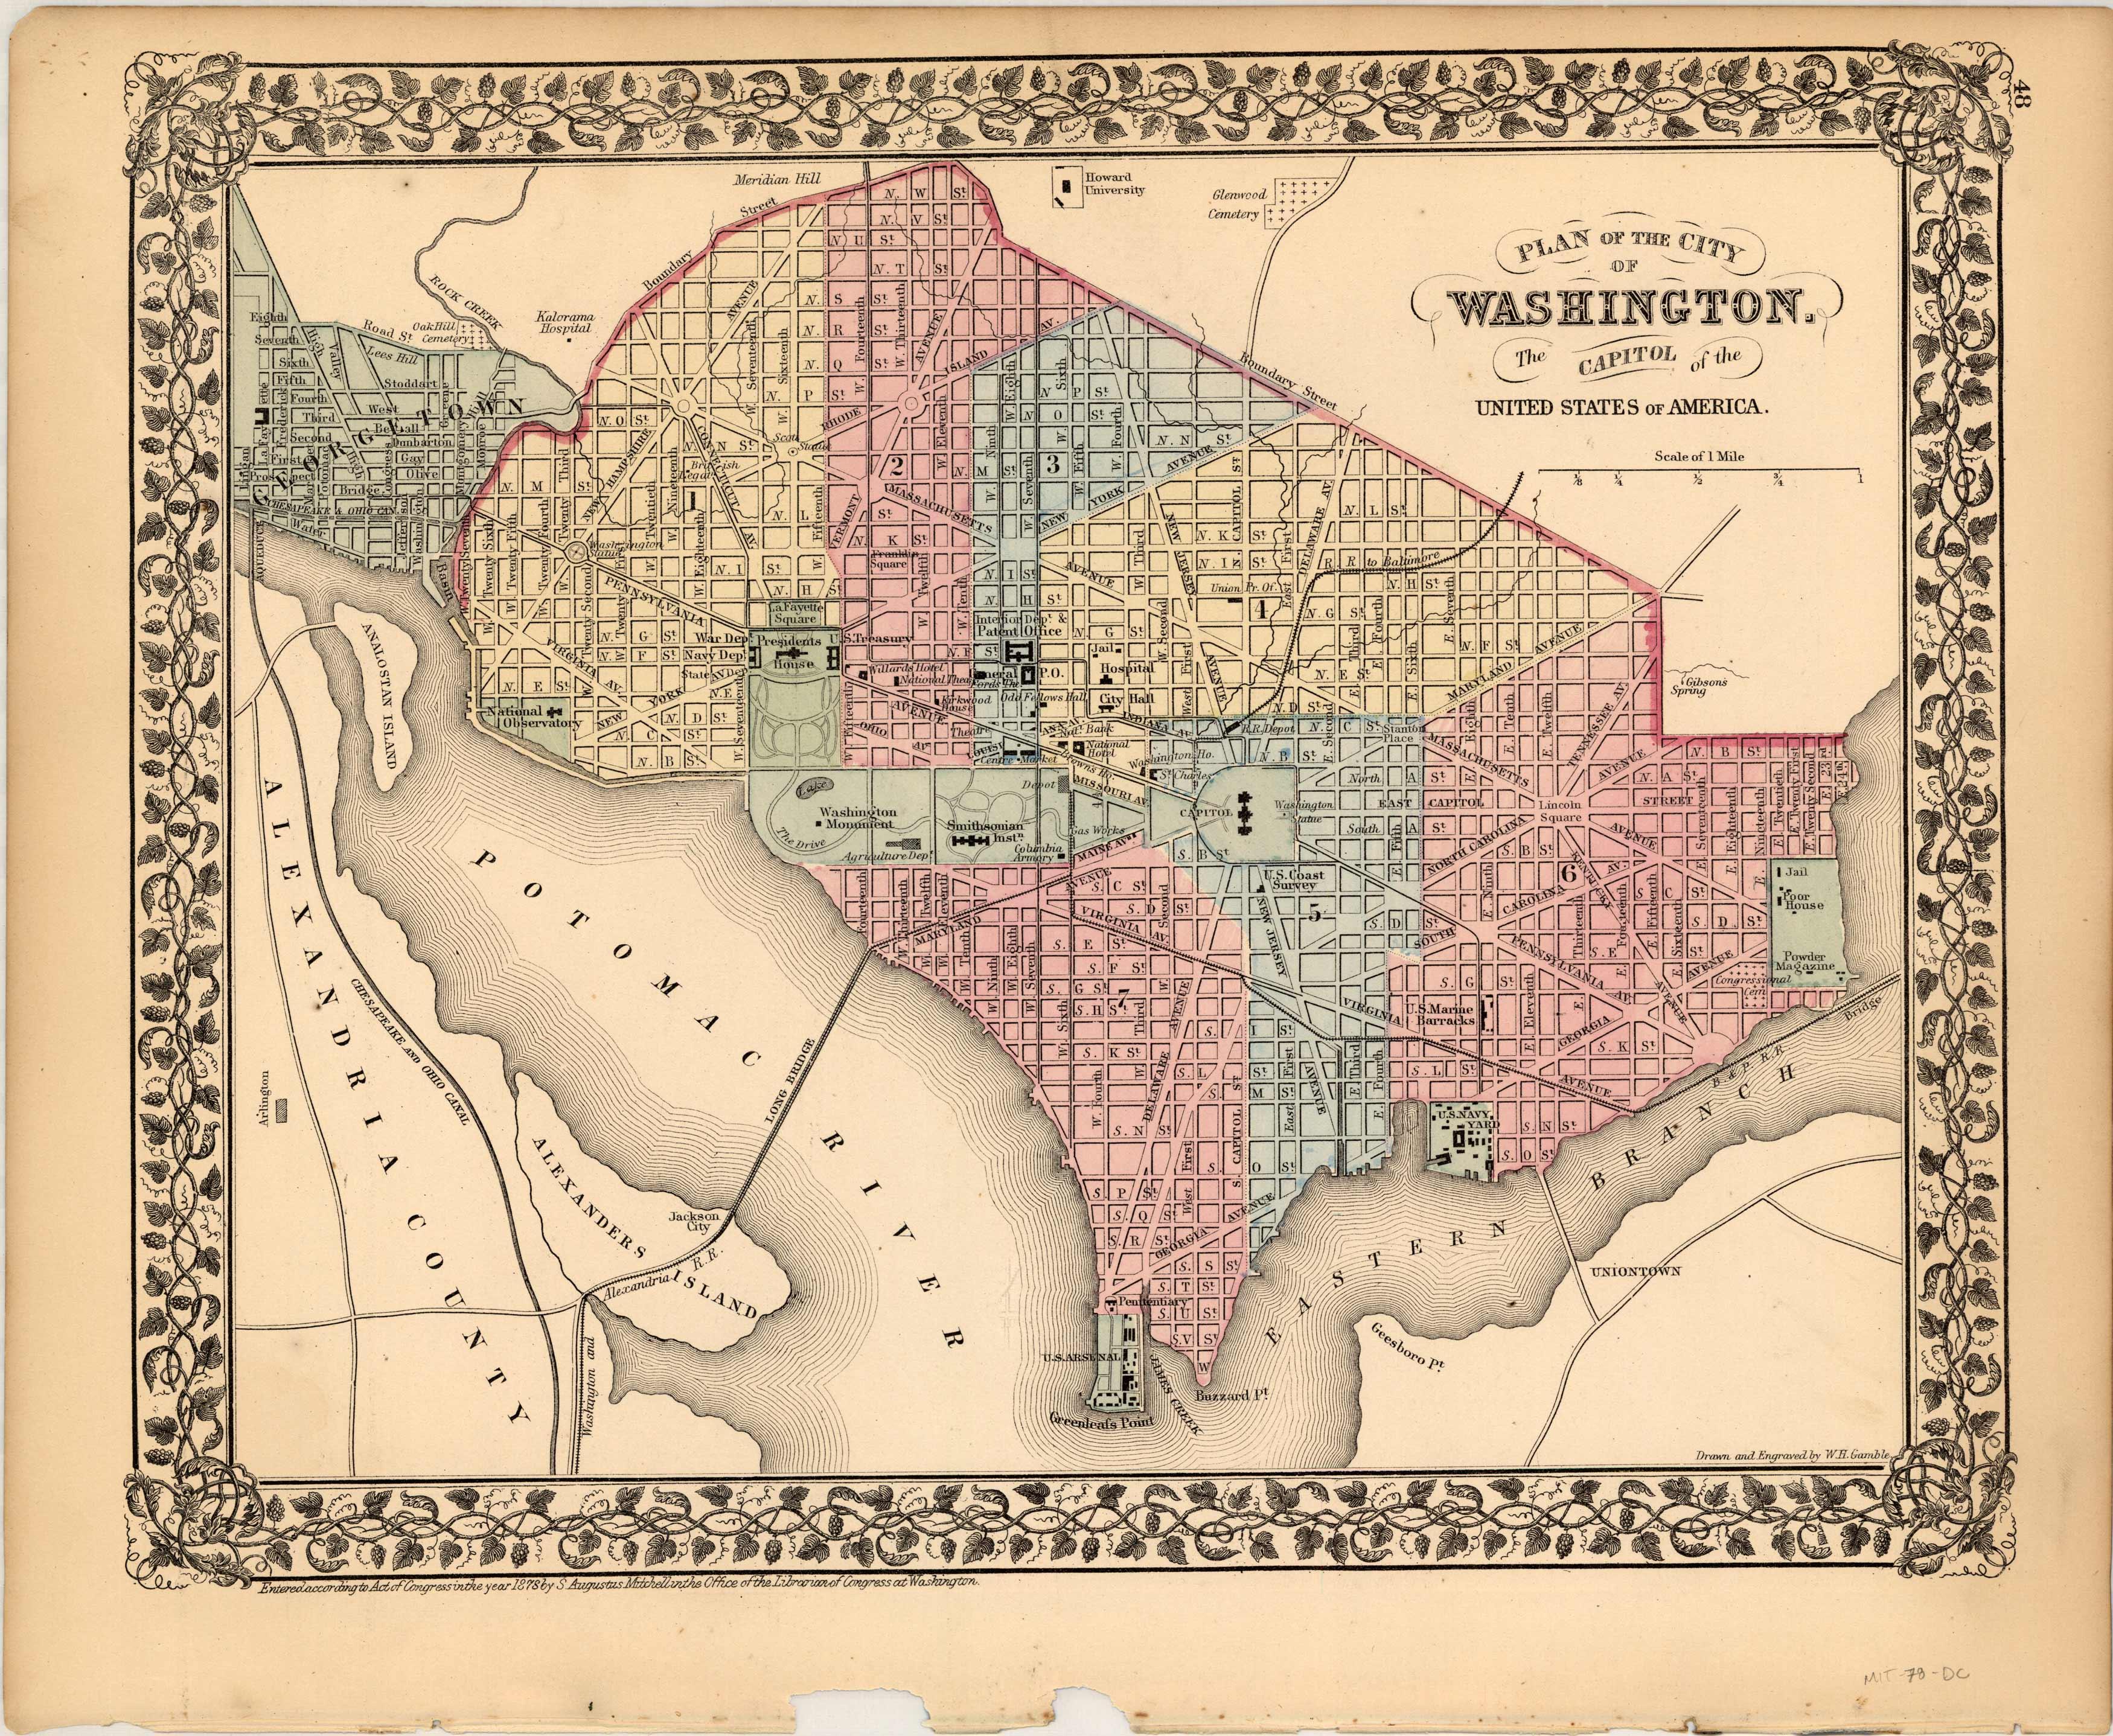 Plan of the City of Washington